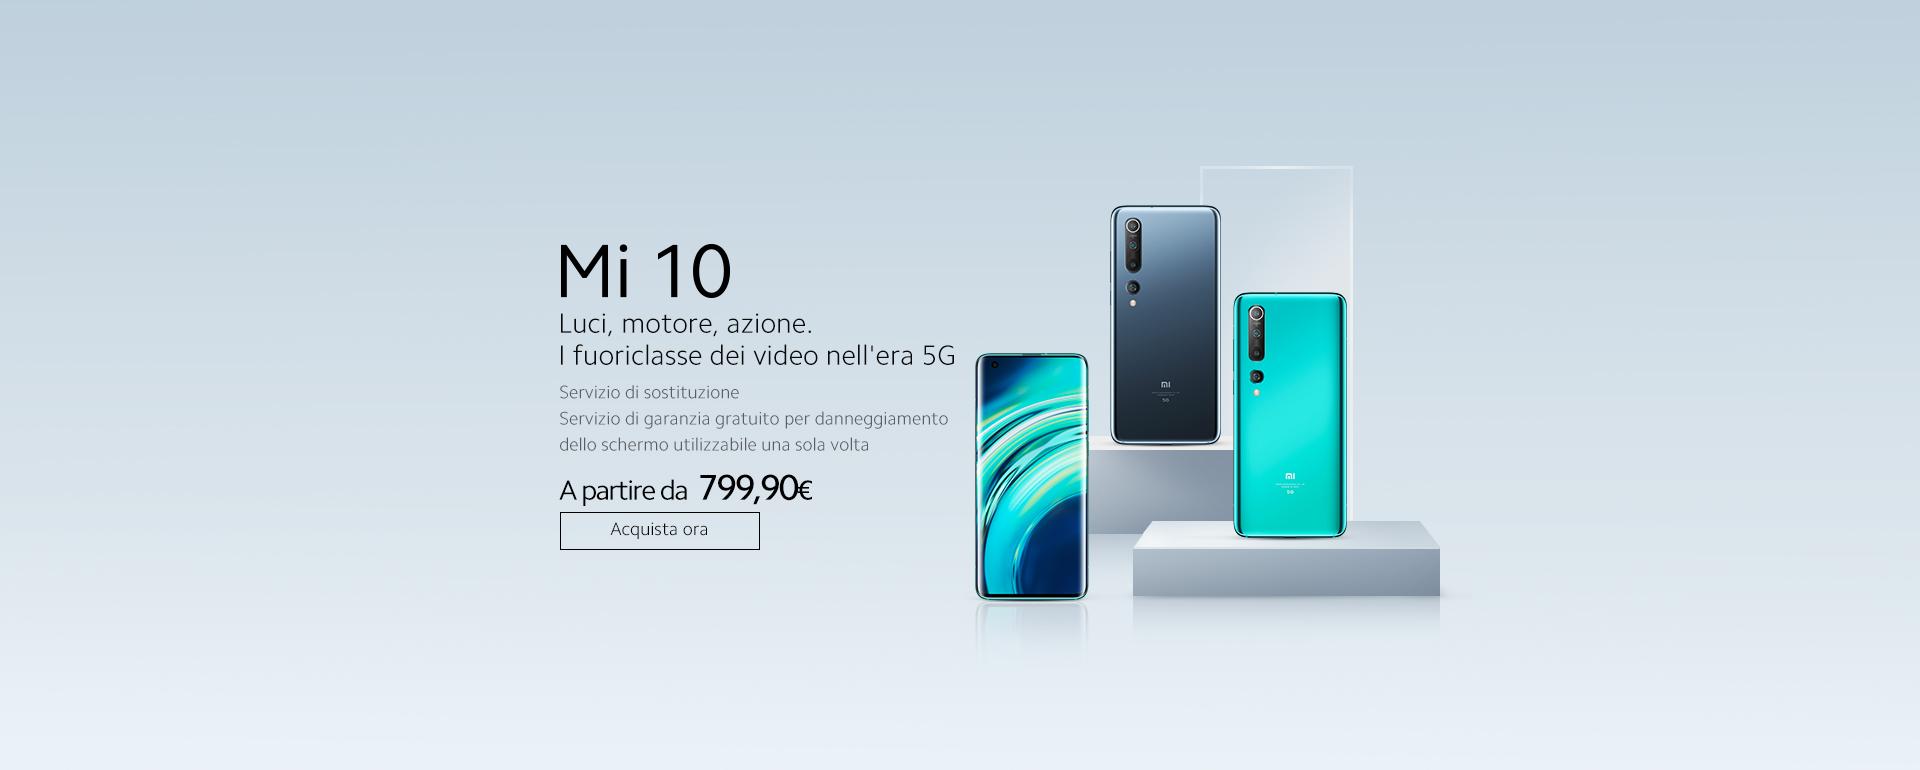 sales2020/mi-10